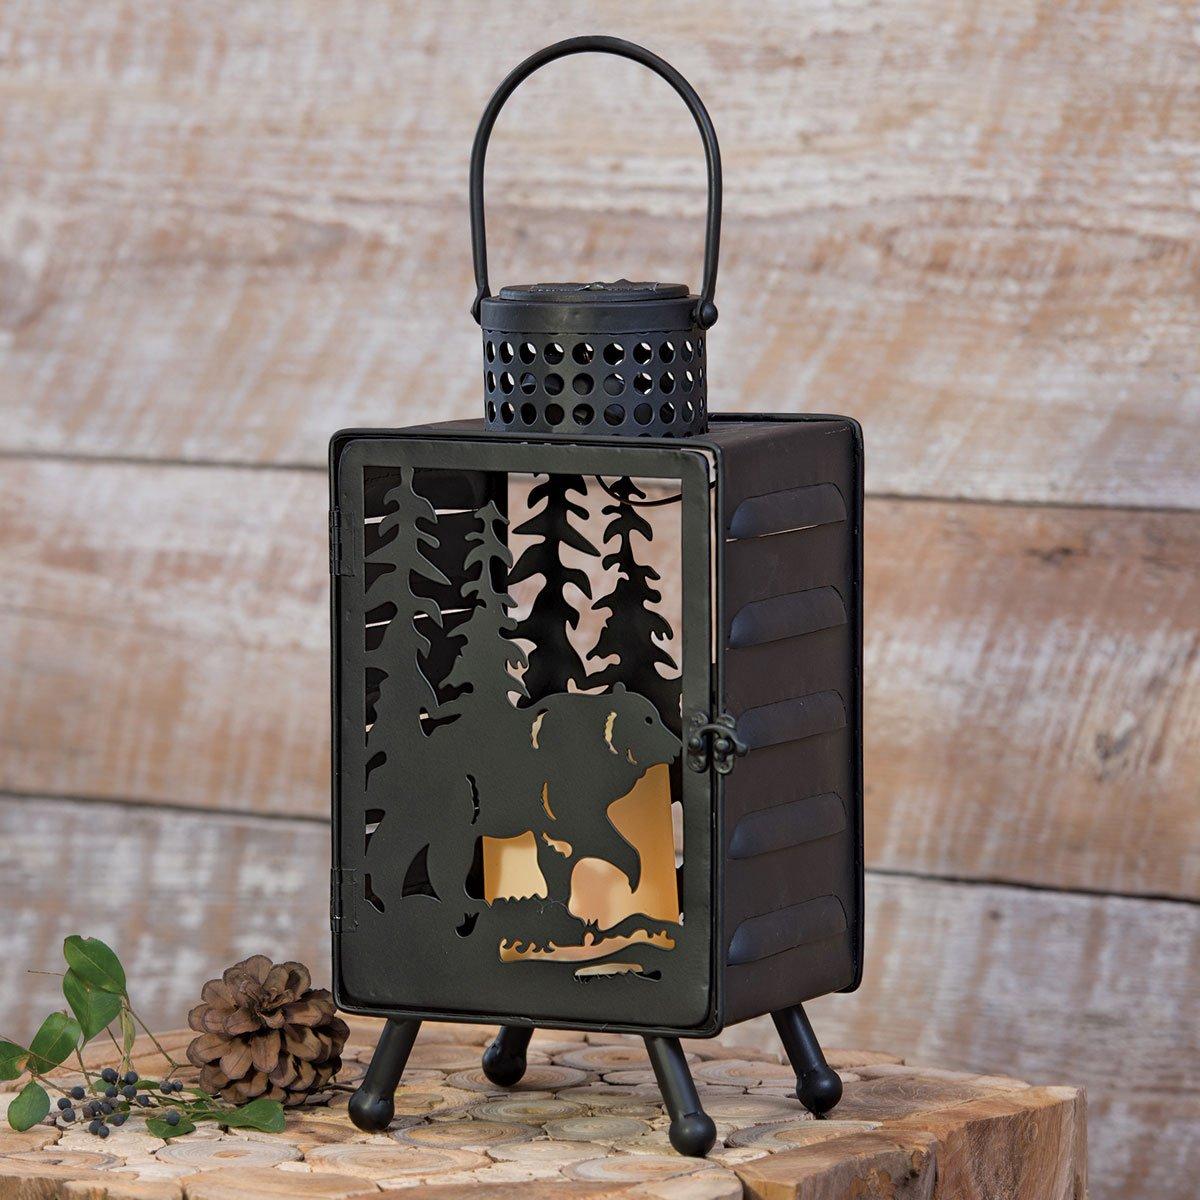 Bear & Pine Tree Solar LED Candle Lantern